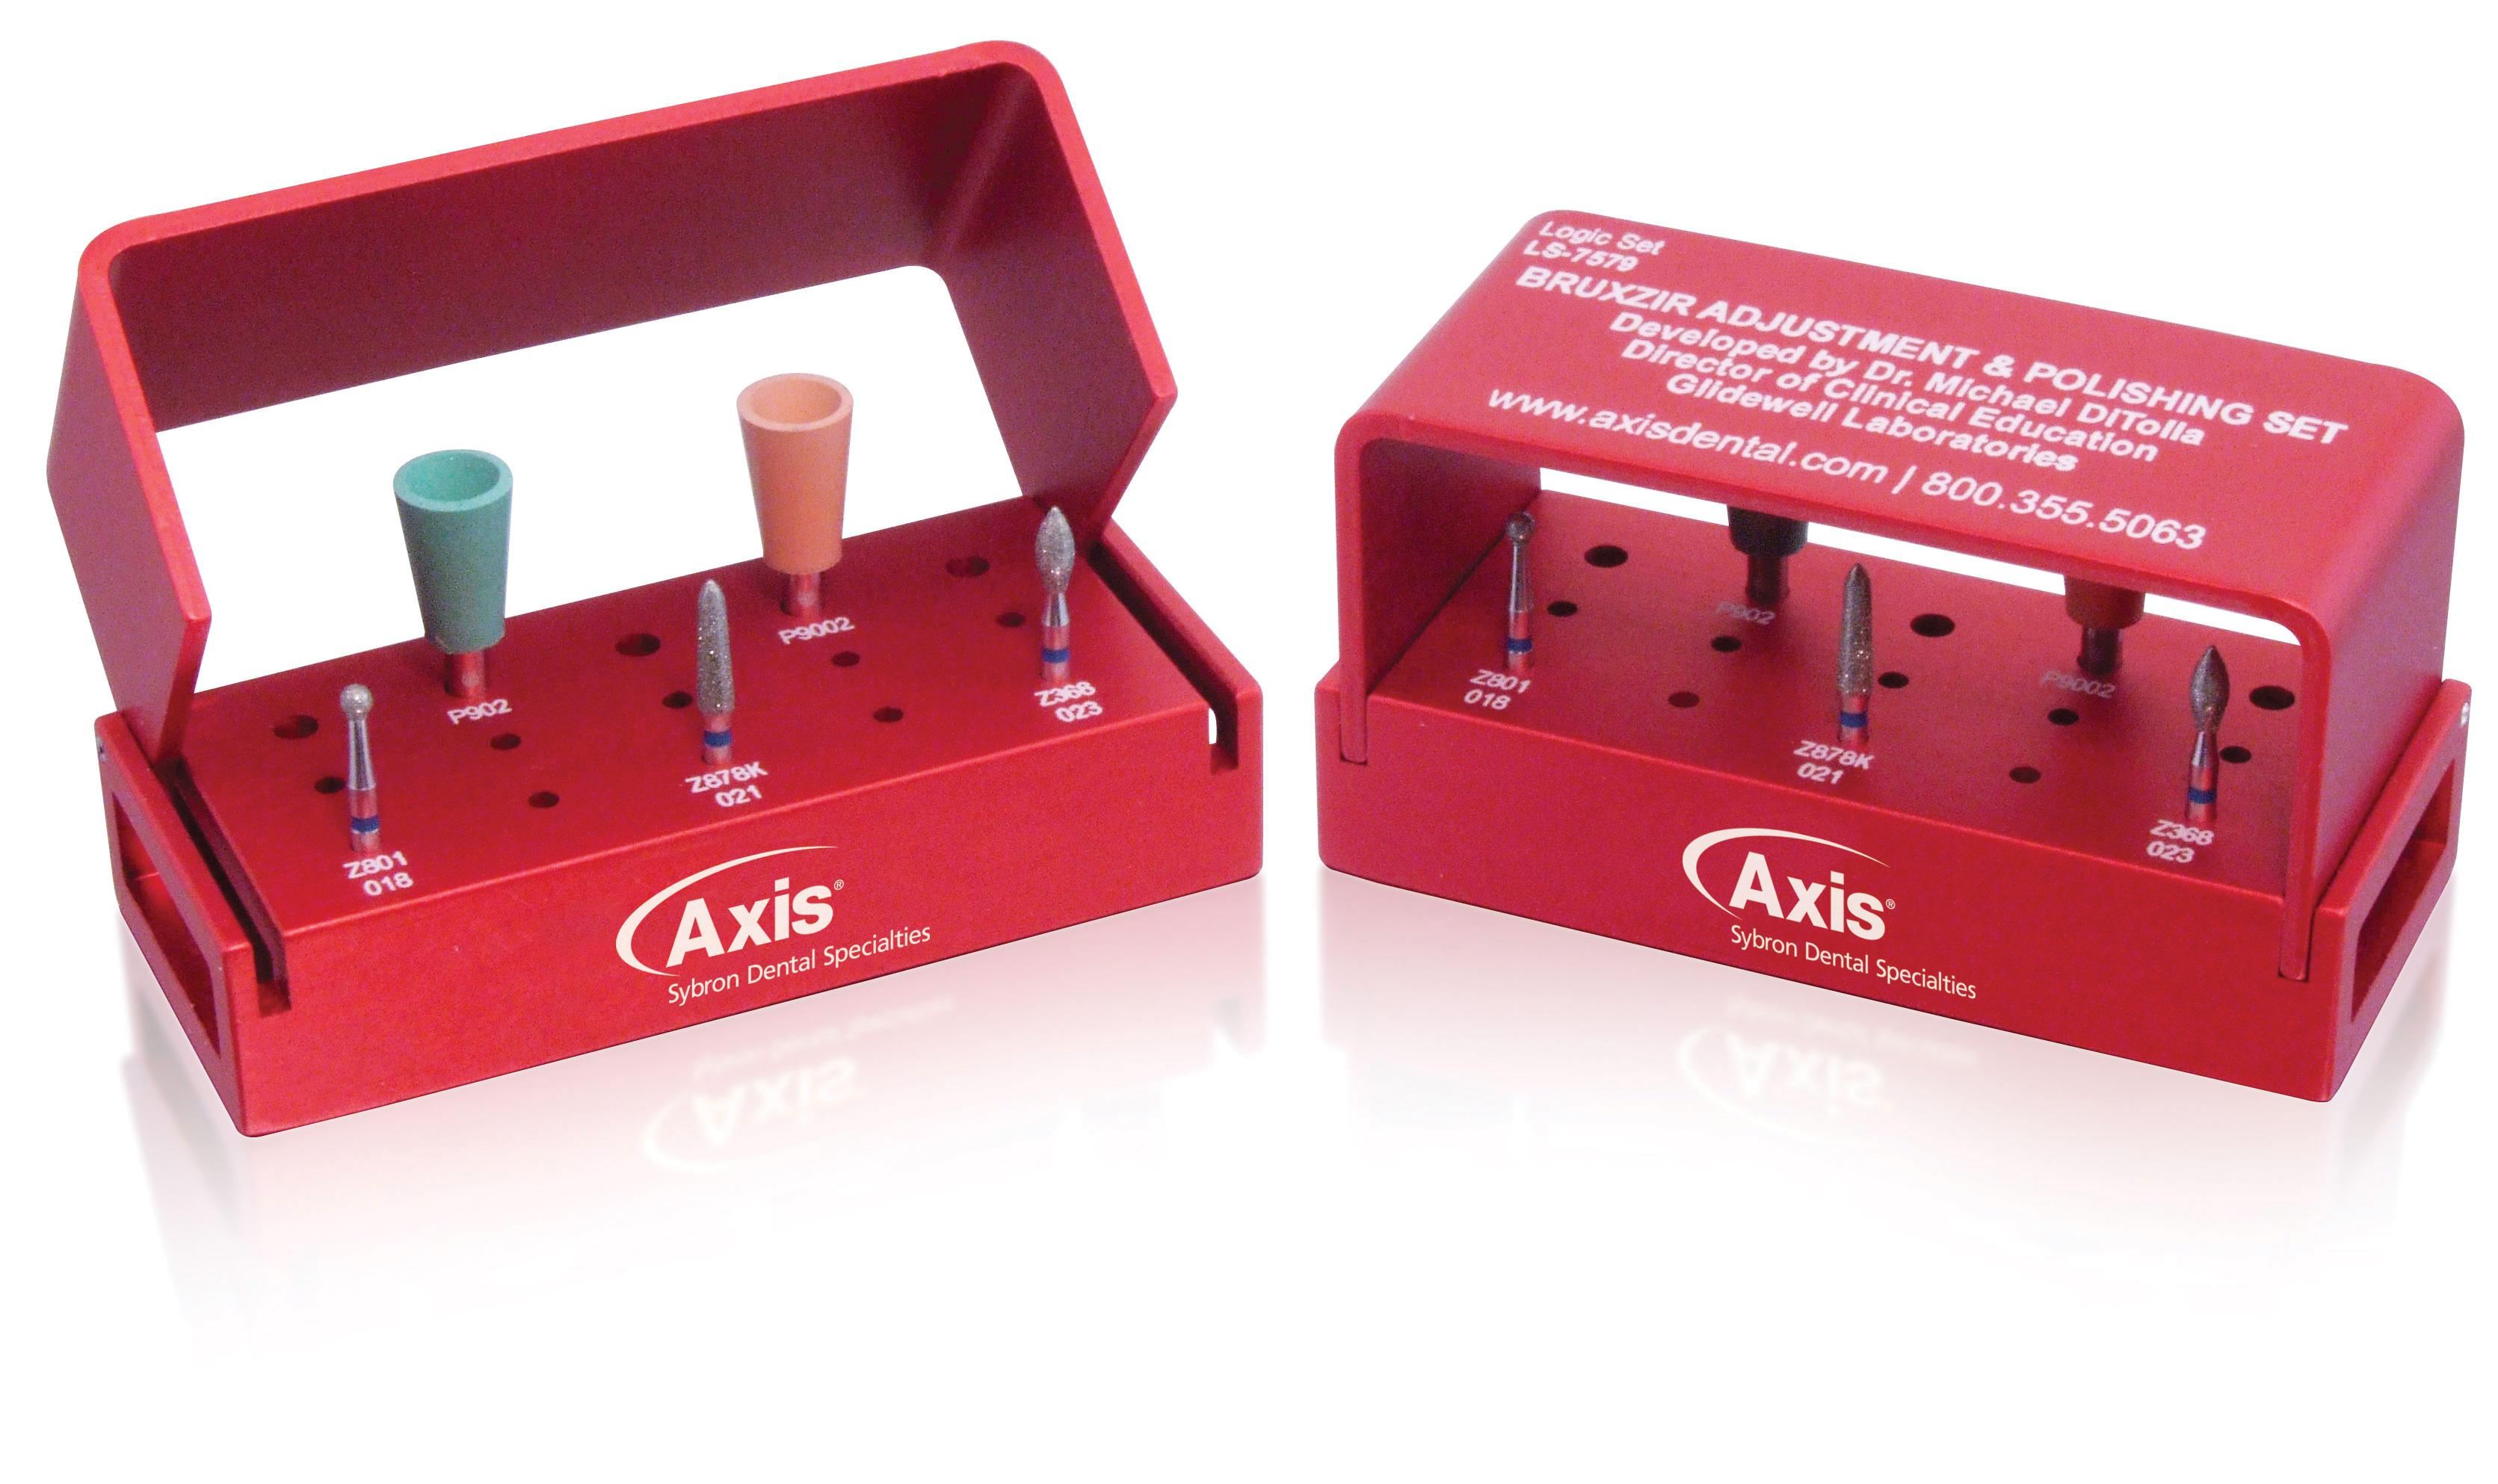 BruxZir Adjustment and Polishing Set LS-7579